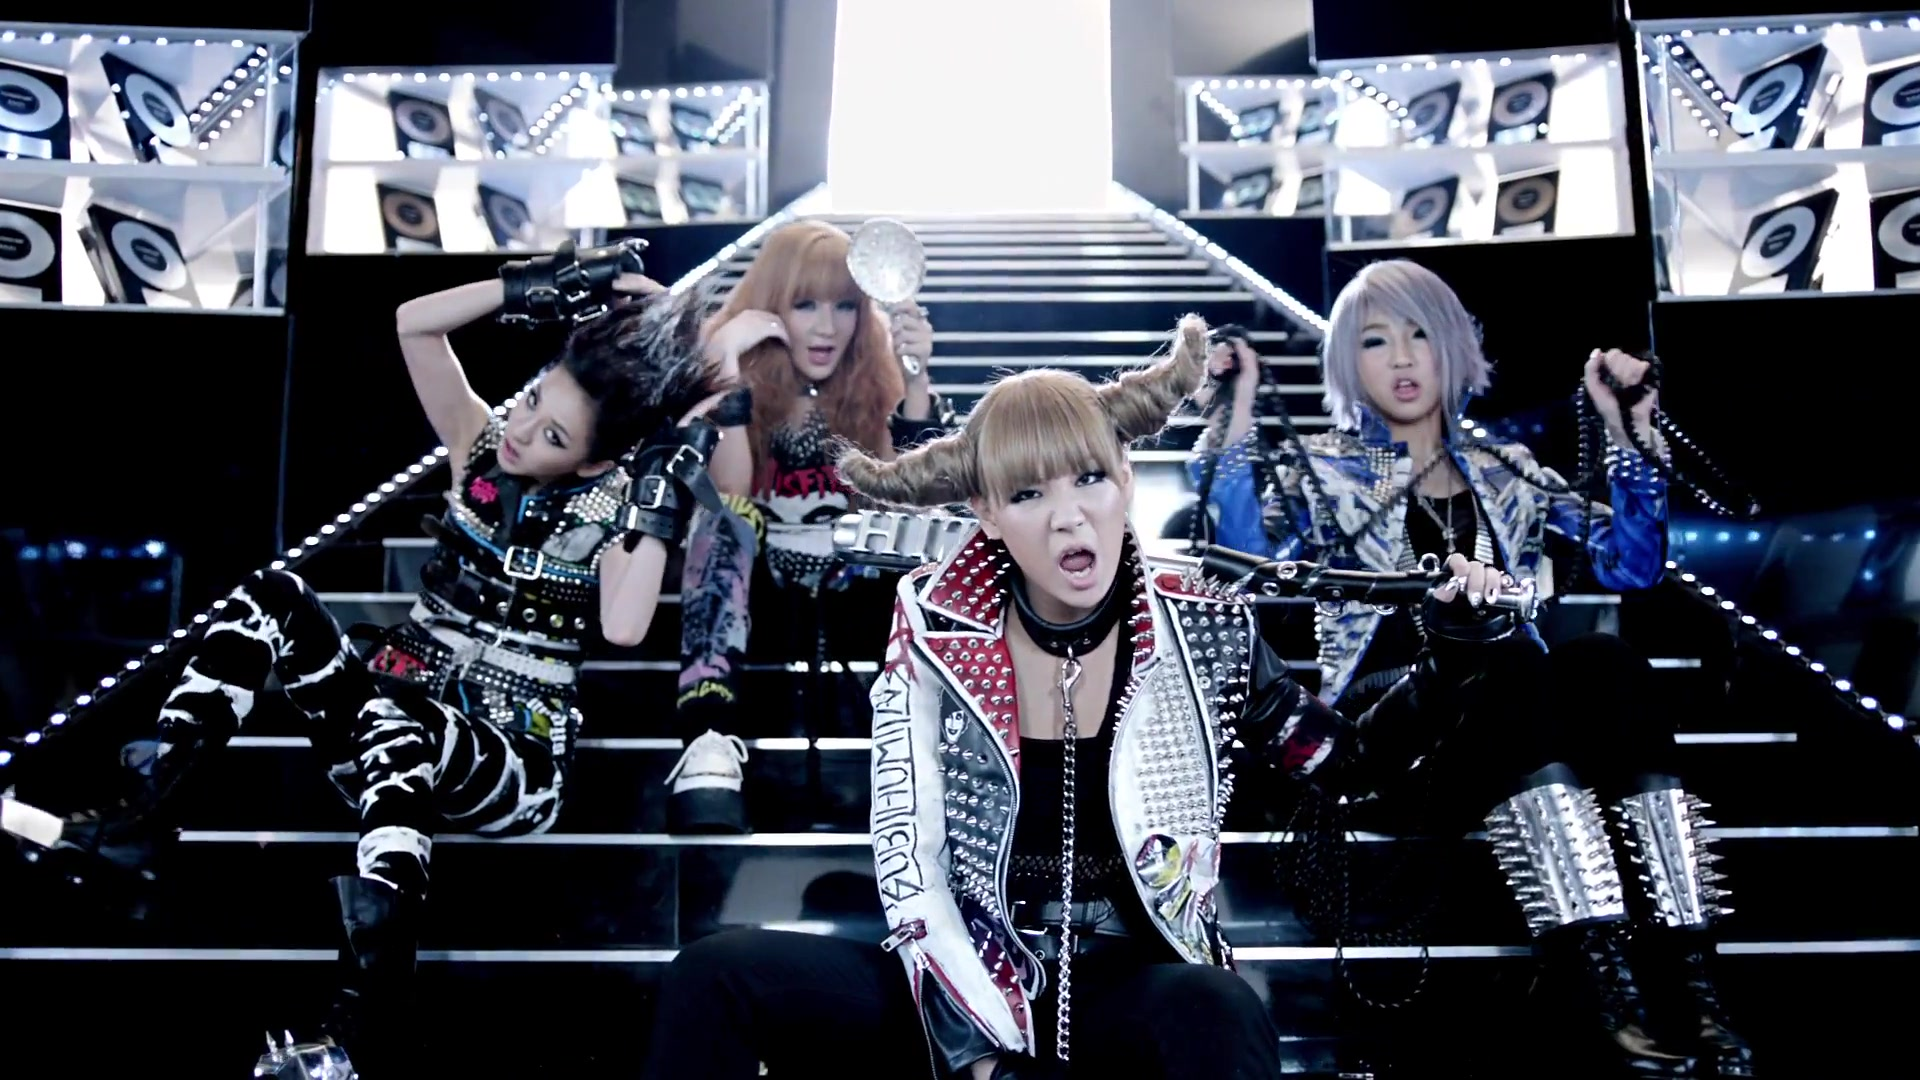 2NE1 - I AM THE BEST (2011)  2NE1許多歌曲都榜上有名,但是這首歌幾乎可以是她們的頂峰之作!就算你前面再怎麼忽視KPOP,也很難不被圈進去的這首歌